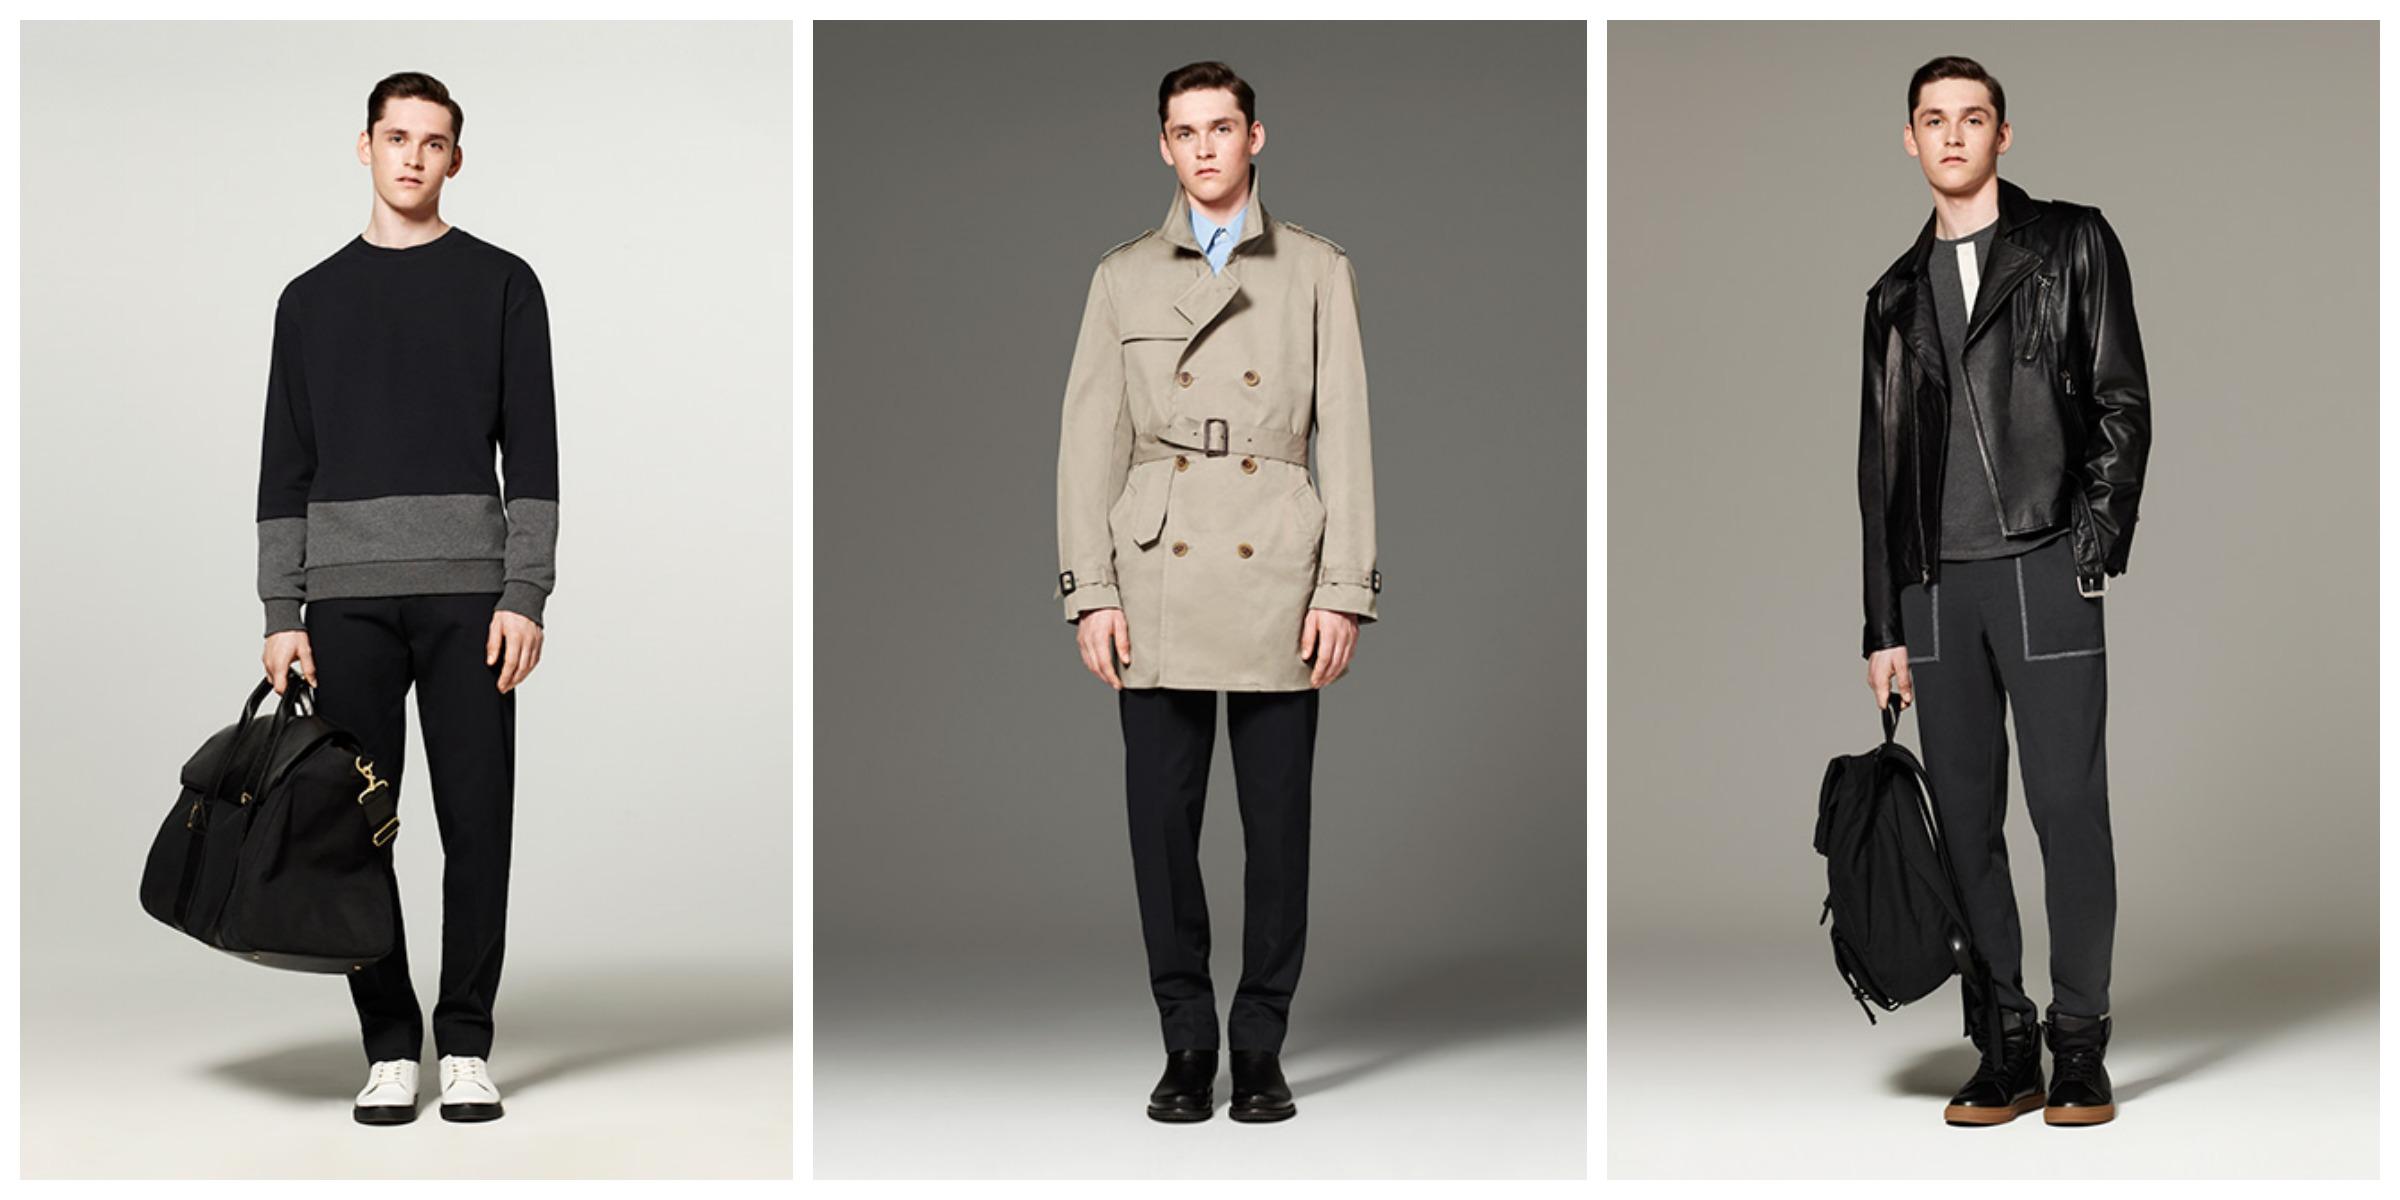 Menswear Fresh: Phillip Lim 3.1 for Target In Stores September 15th